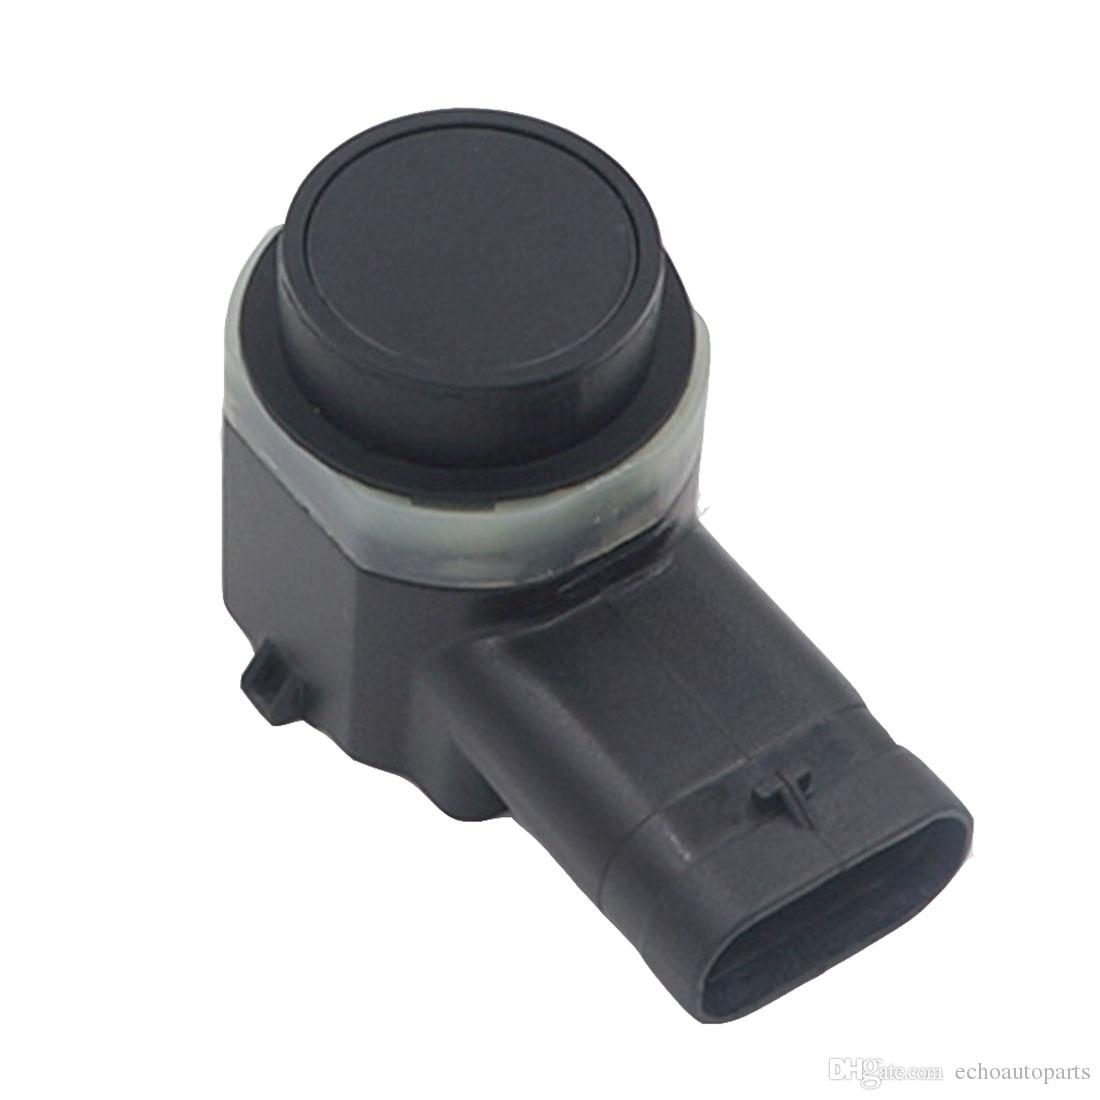 Hohe Qualität Auto 5KD919275B PDC Parken-Sensor Für Audi A3 A6 A7 Q3 VW Seat Skoda